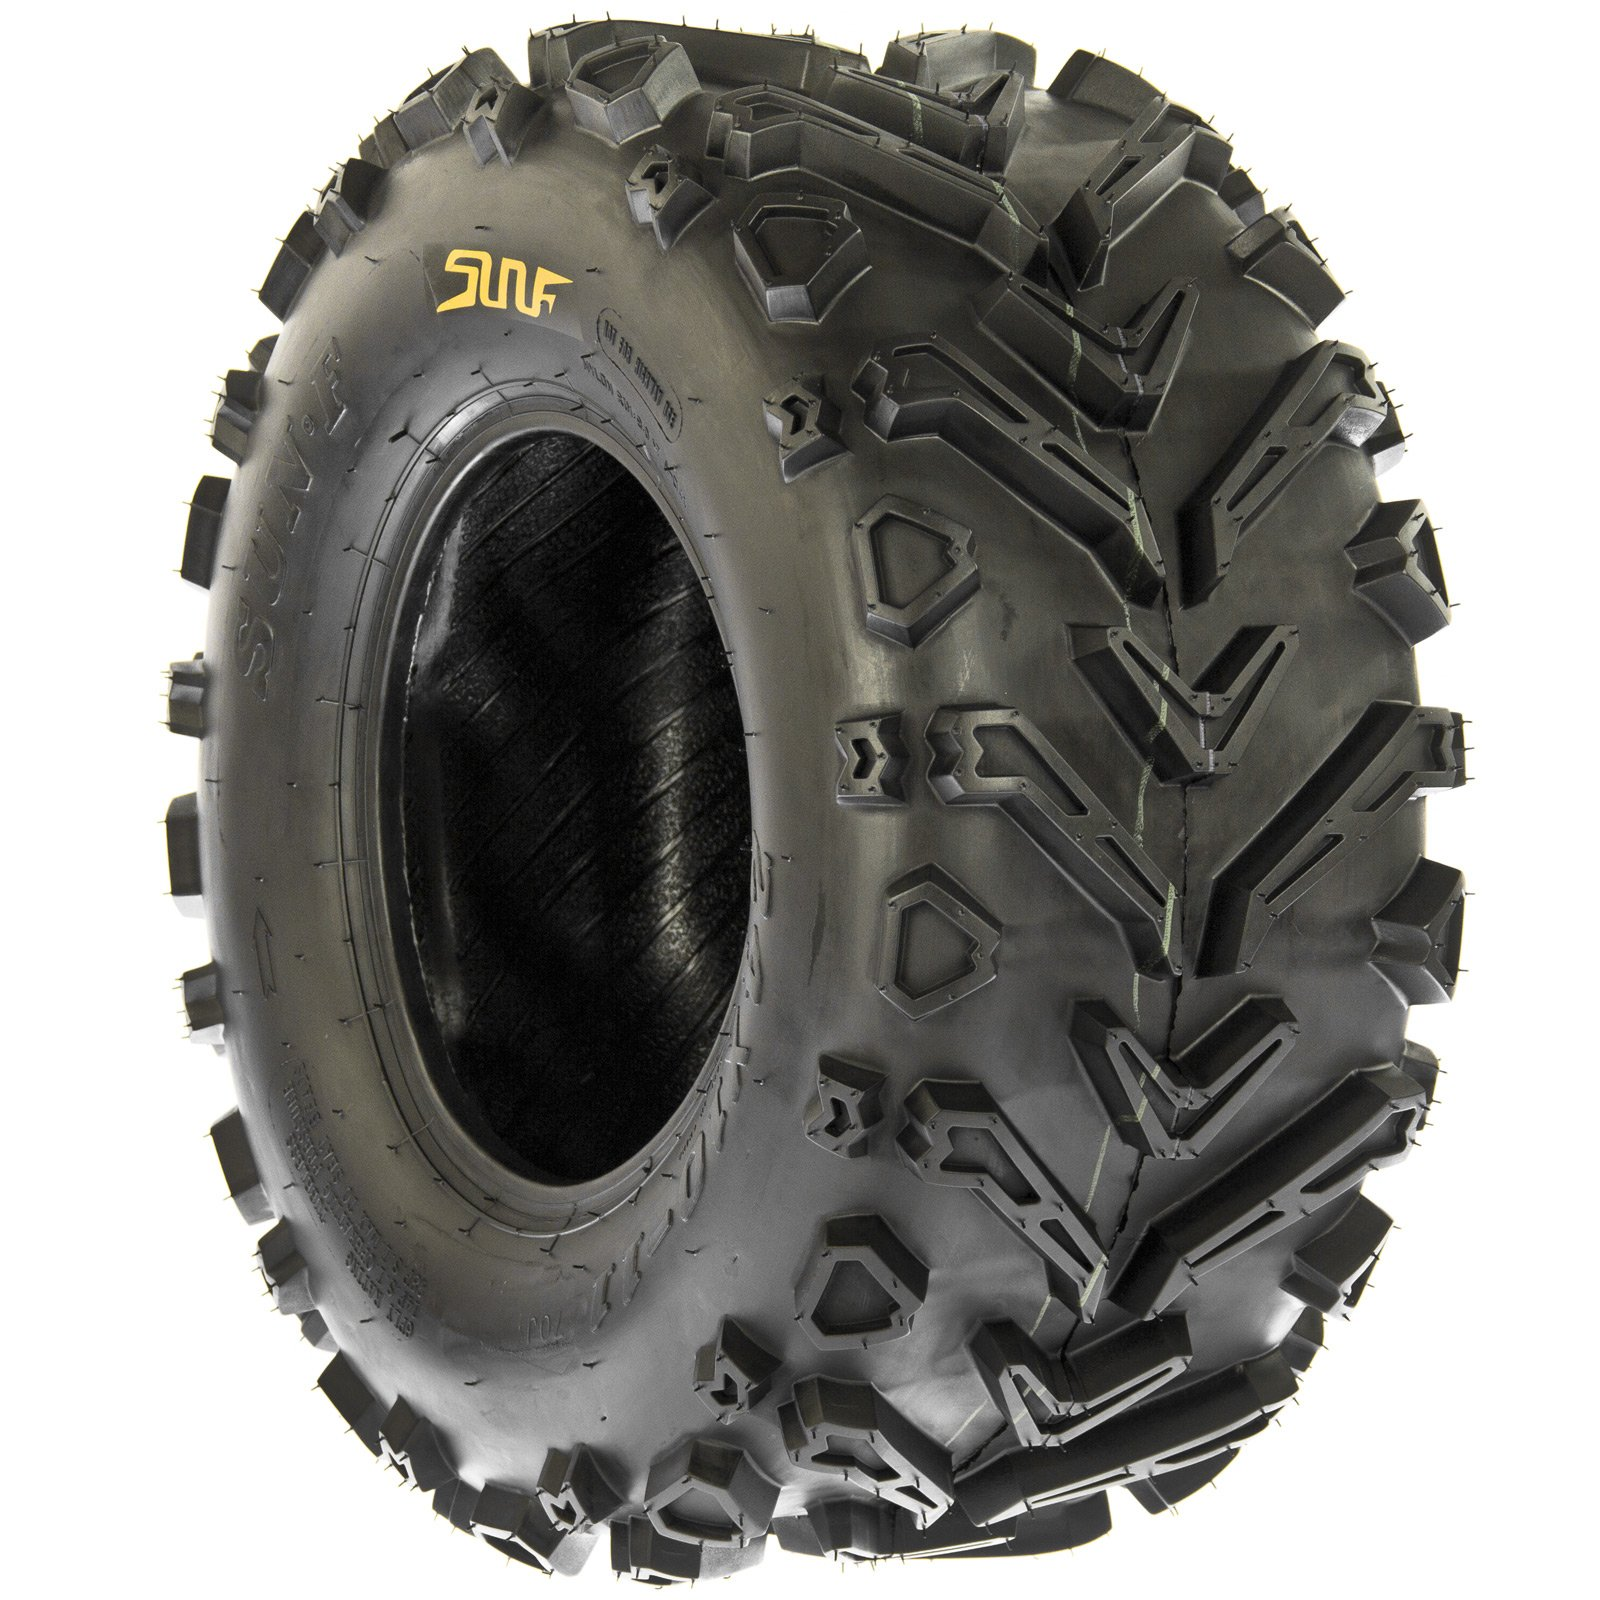 SunF All Trail & Mud ATV UTV Tires 24x8-12 24x10-11 6 PR A041 (Complete Full Set of 4) by SunF (Image #7)